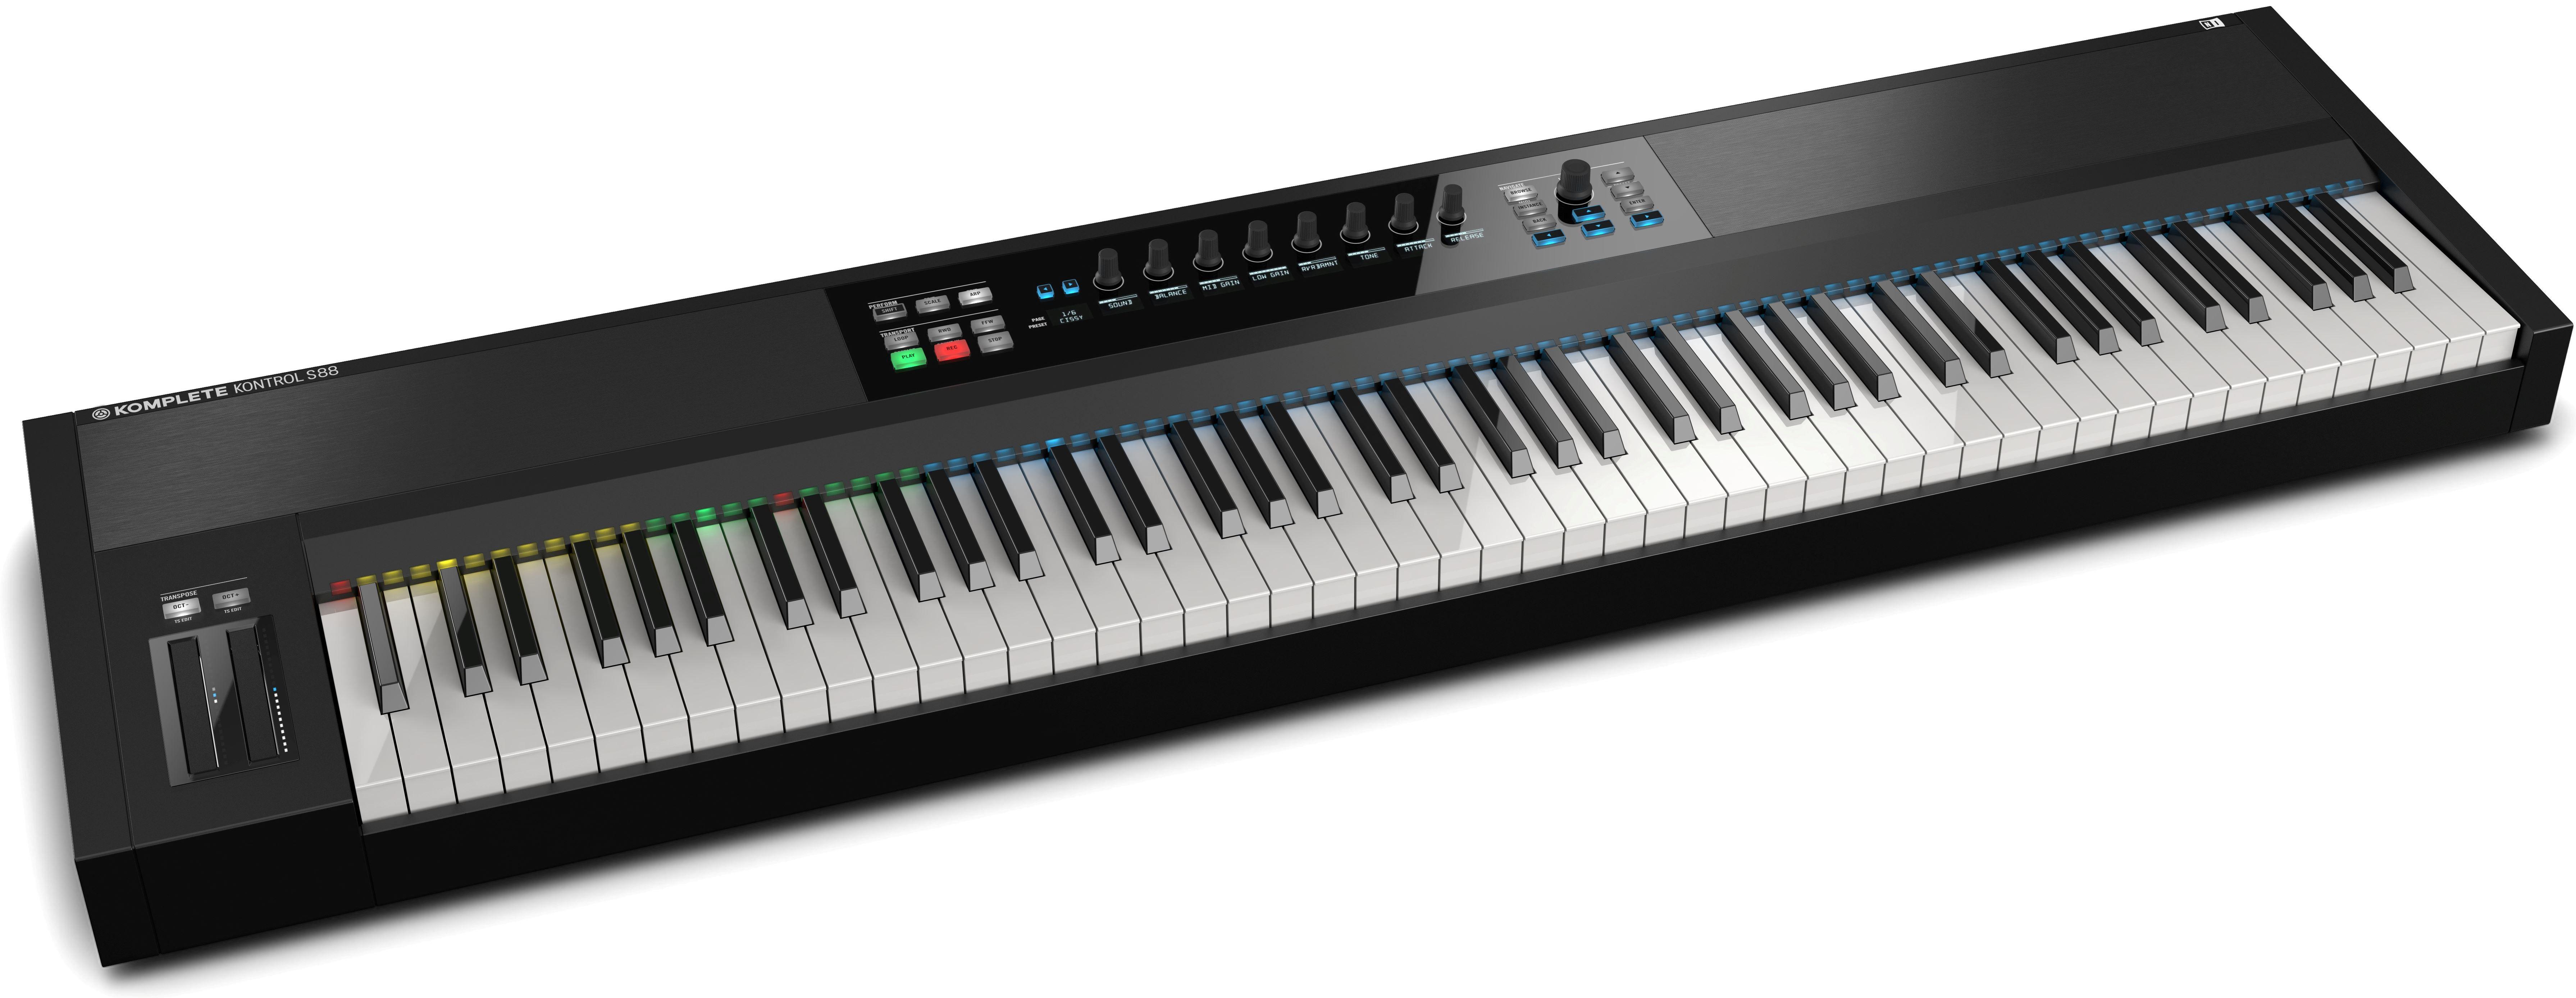 Native Instruments S88 MK2 MIDI keyboard